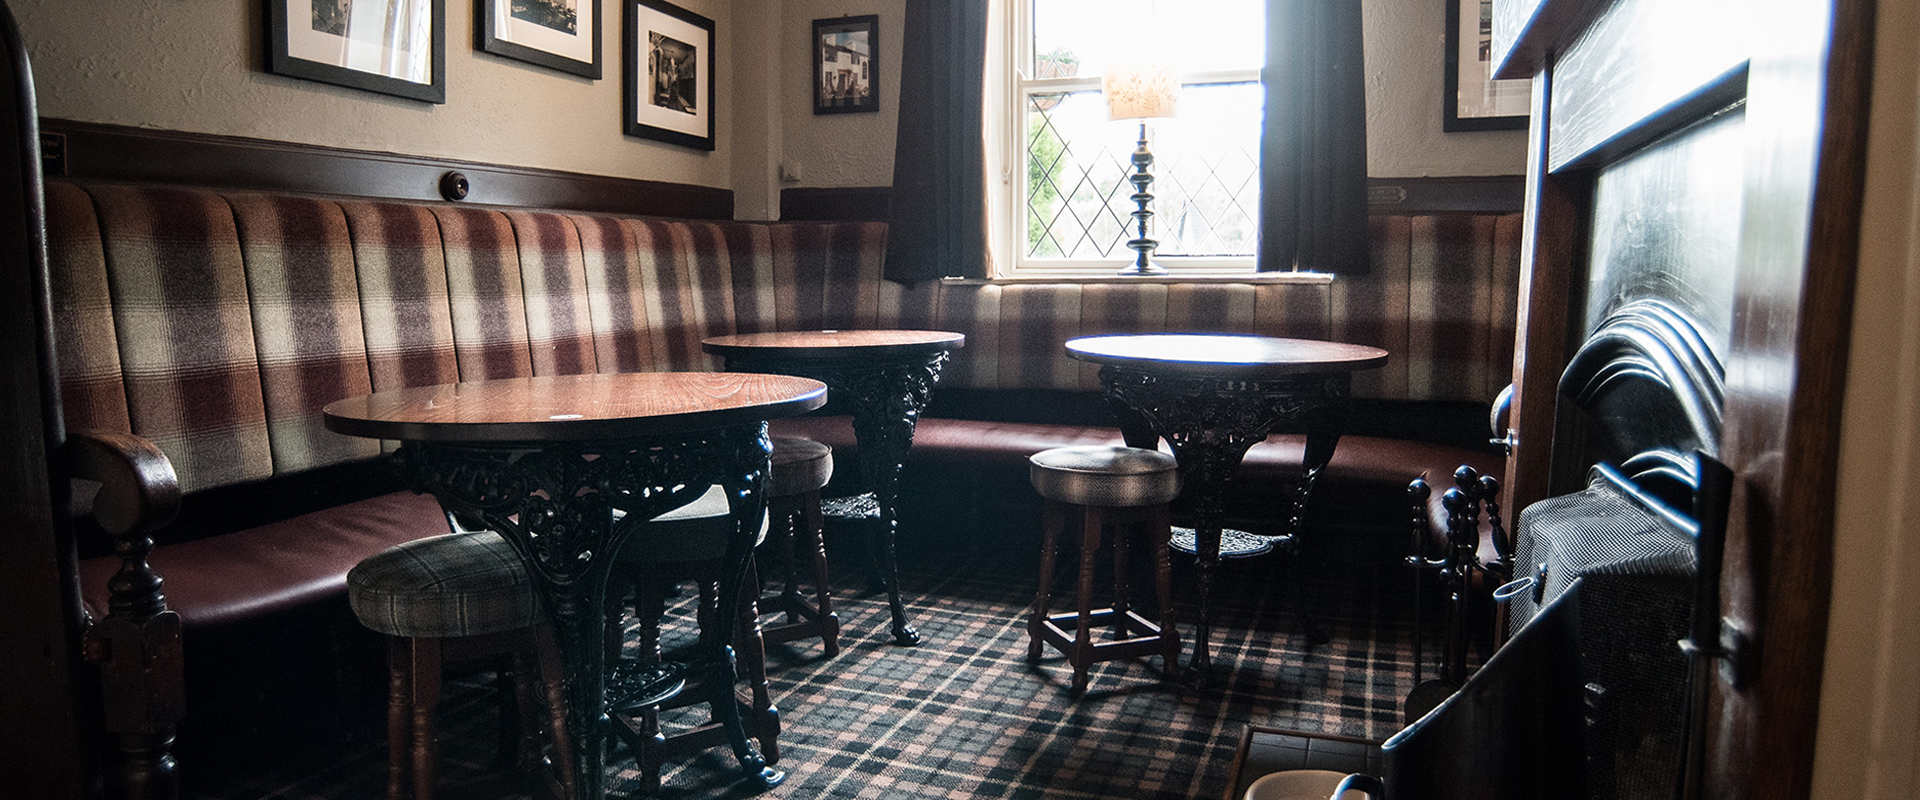 black dog pub belmont inside seating area